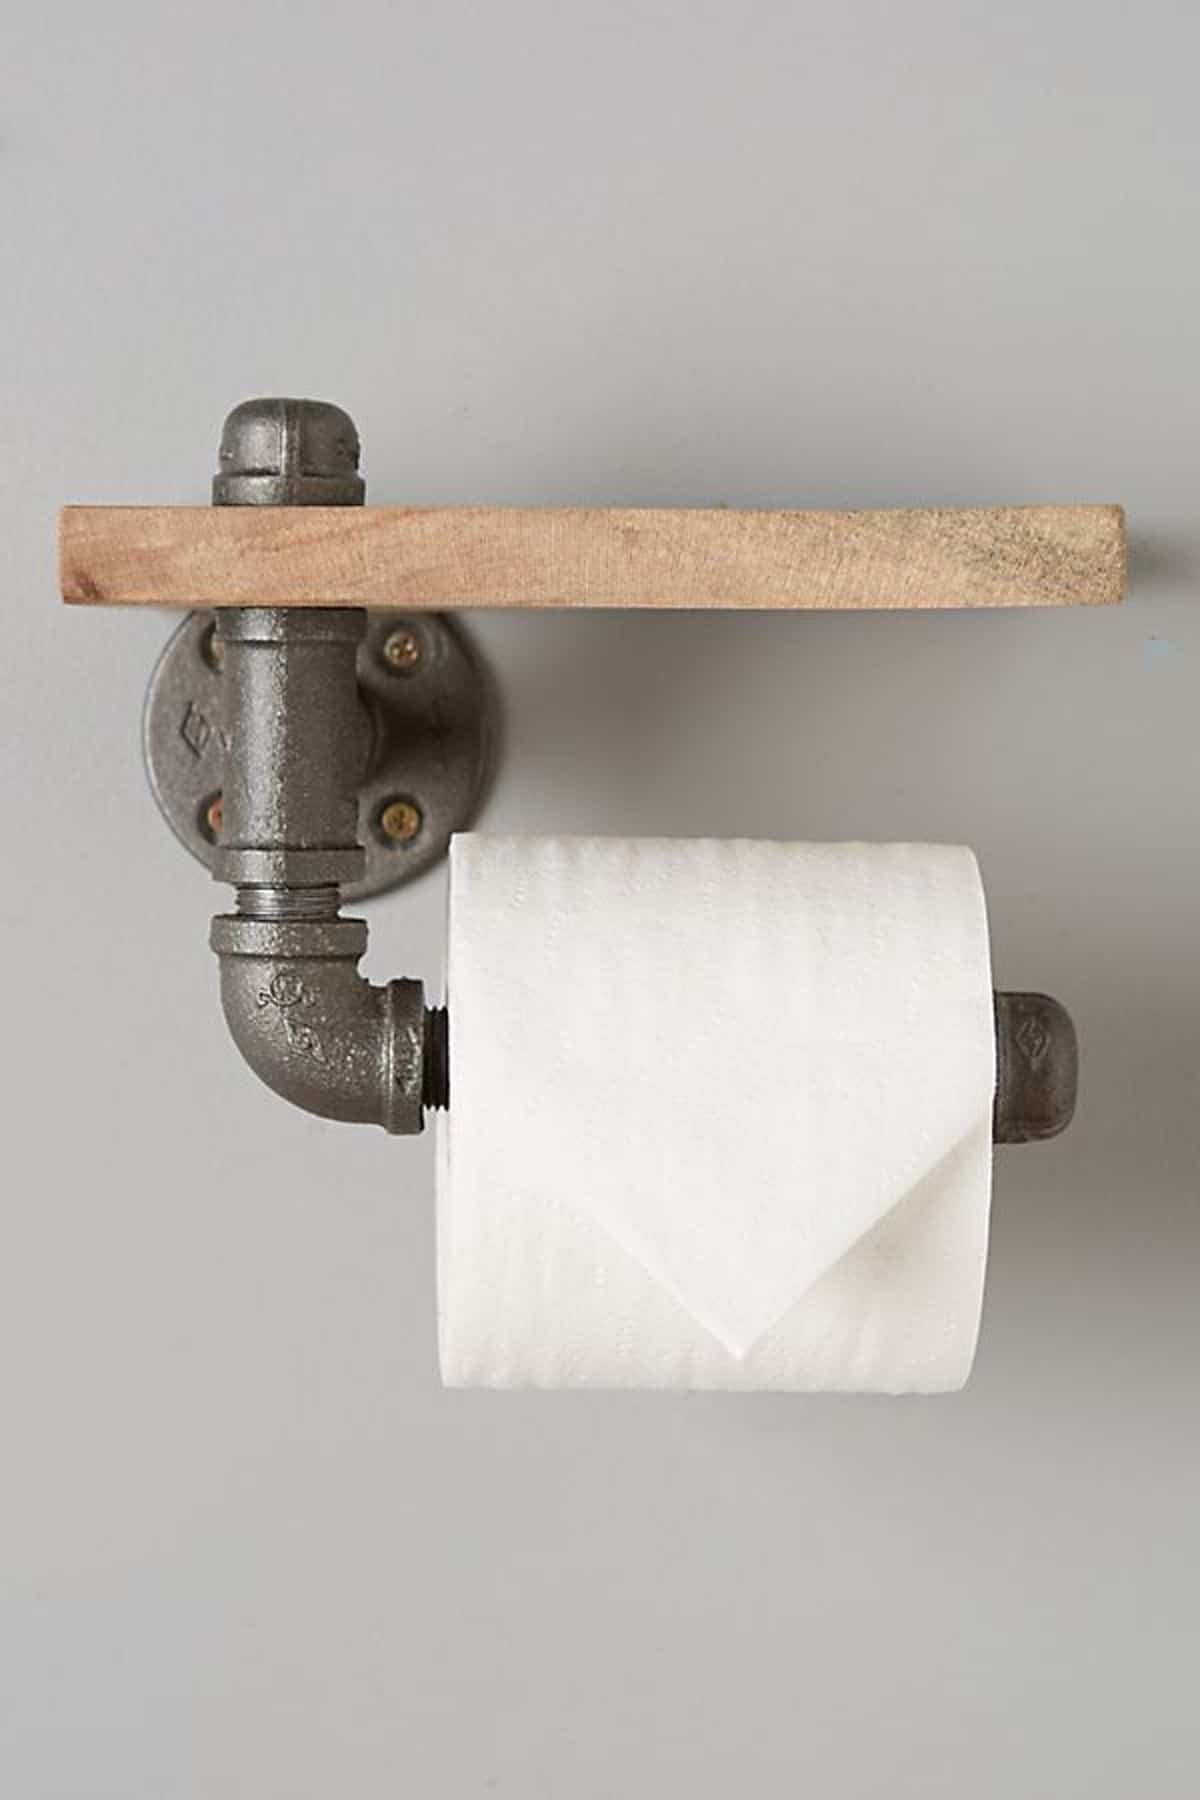 Toilet Paper Holder on Pipe